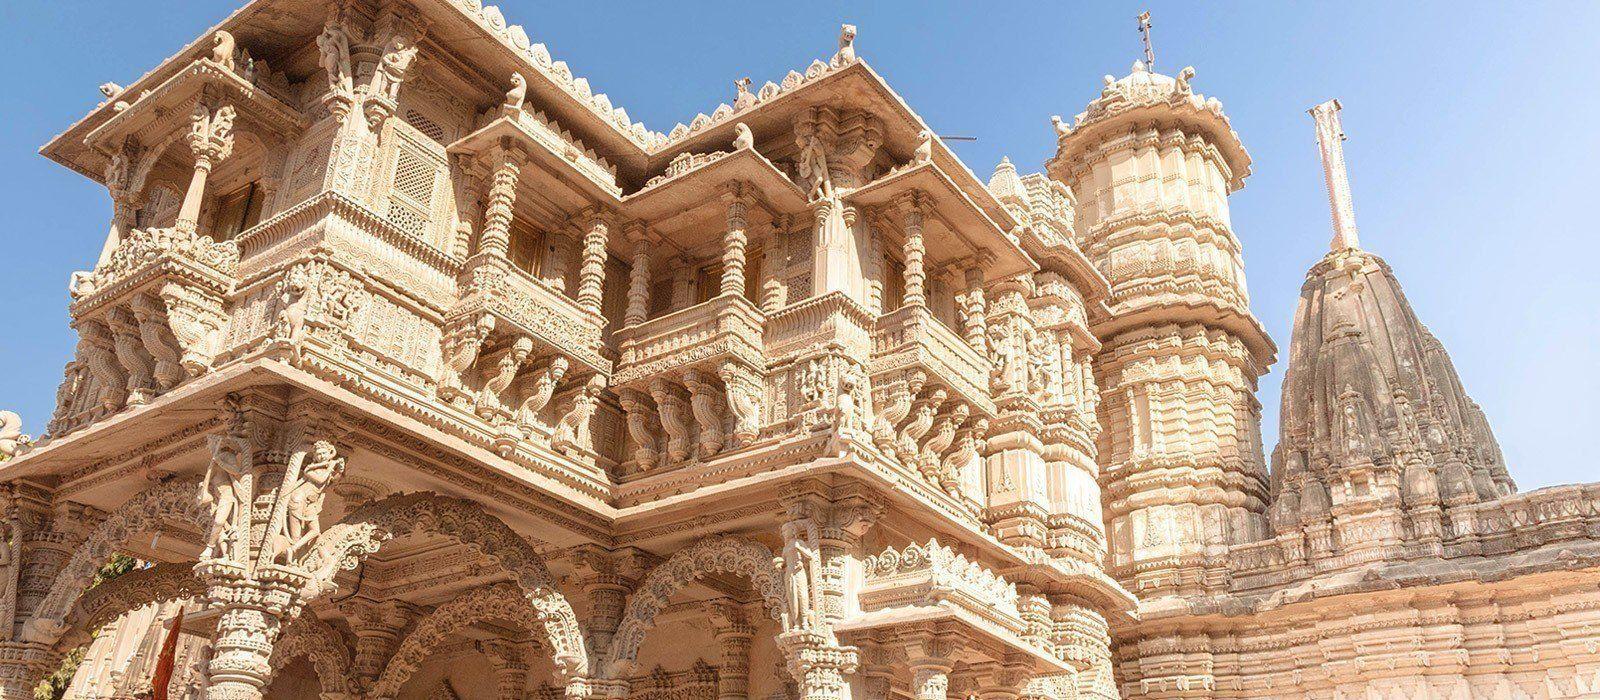 Reiseziel Ahmedabad Zentral- & Westindien